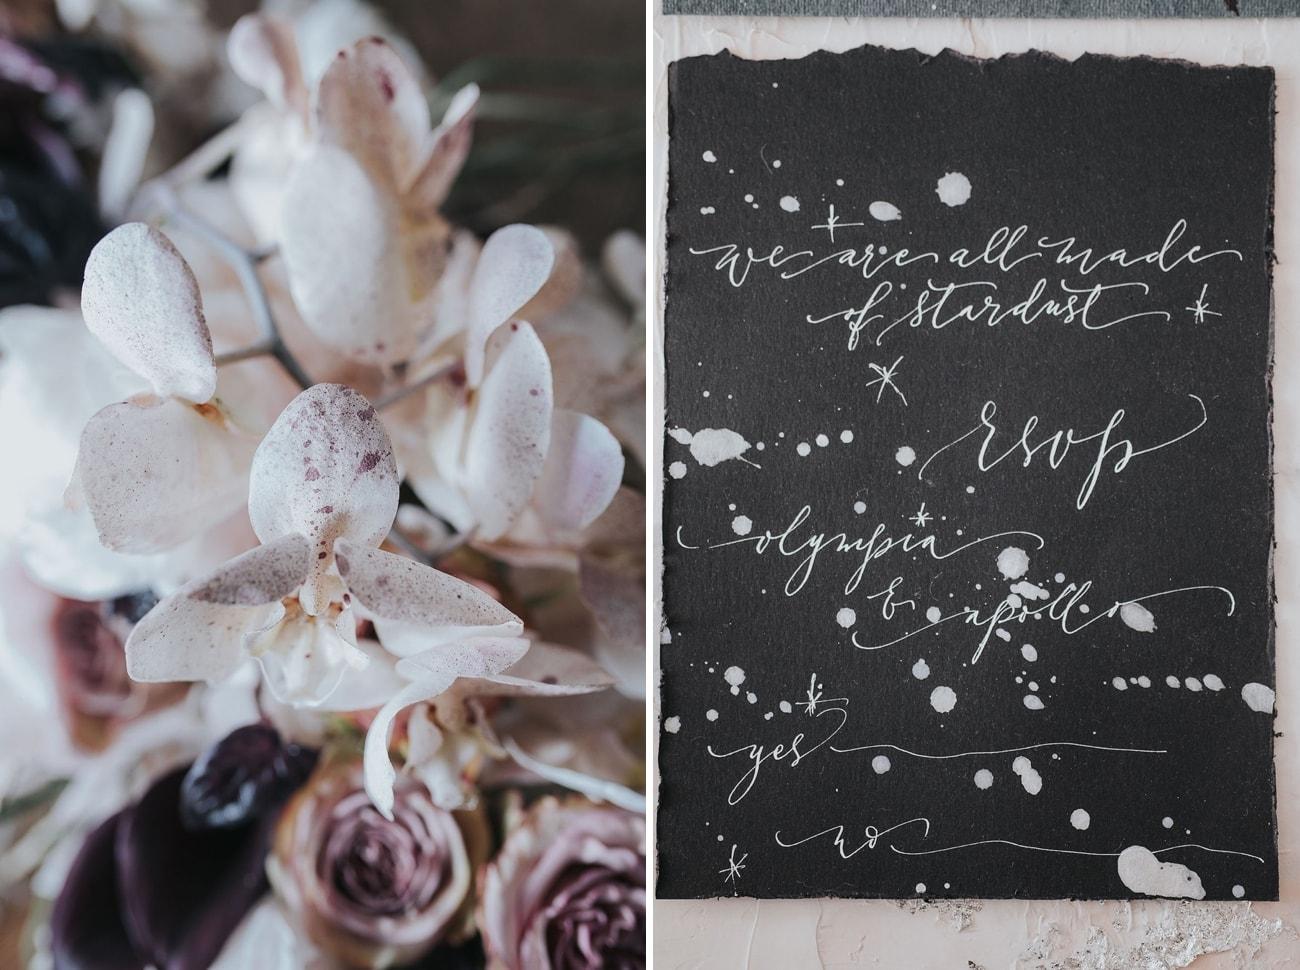 Orchids & Calligraphy | Credit: Cornelia Lietz